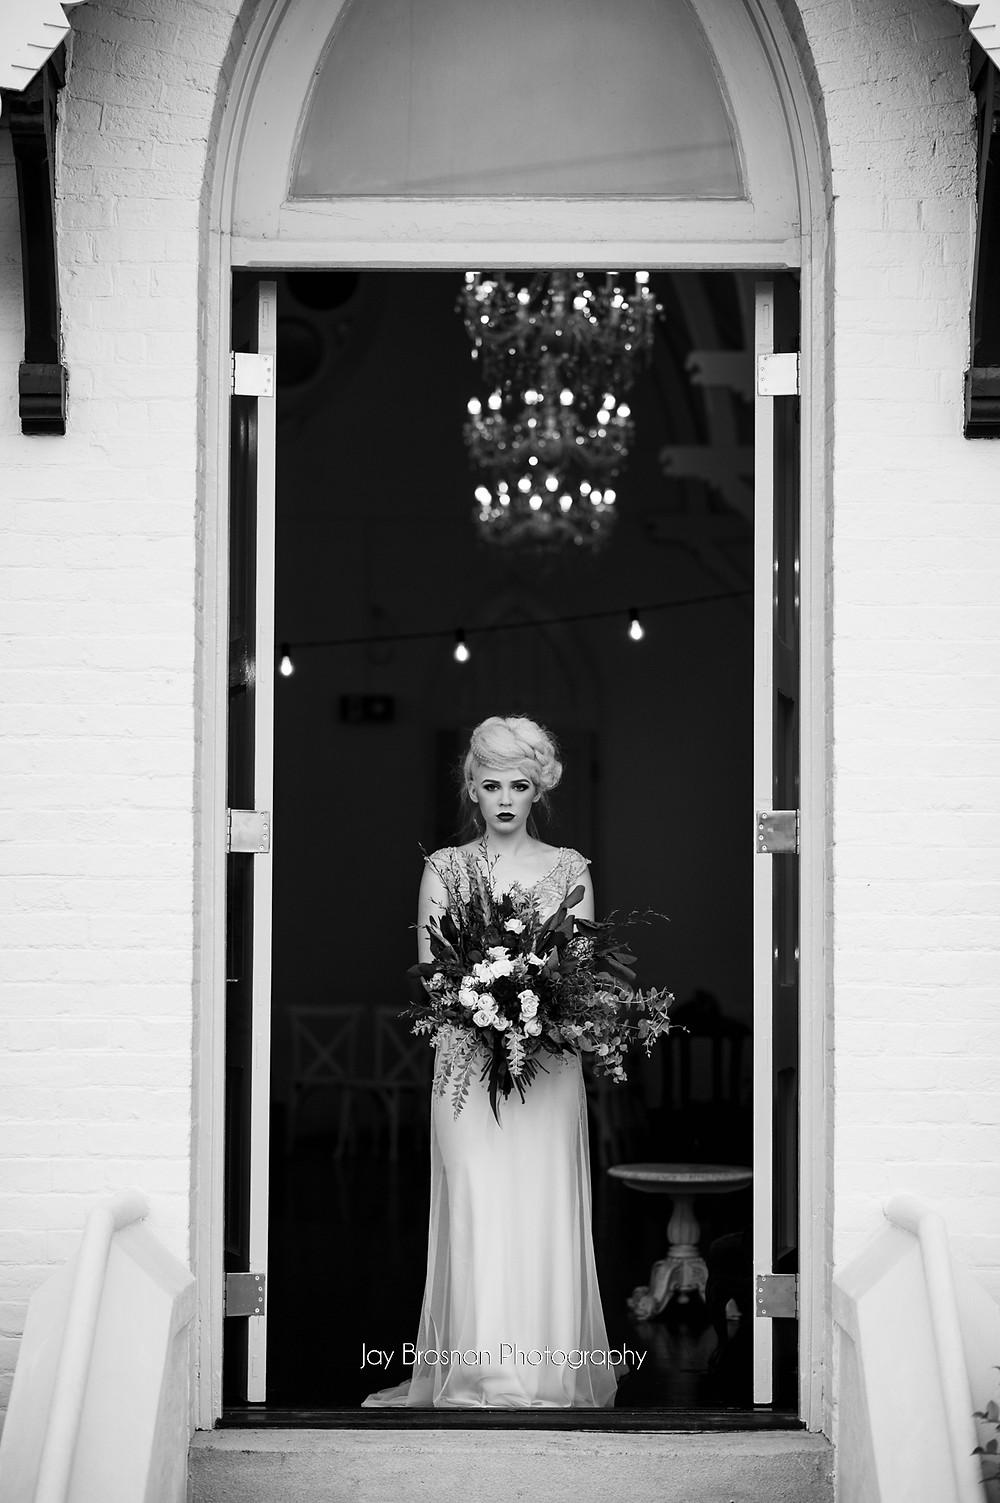 Jay Brosnan Photography | Brisbane Wedding Photographer | Sunshine Coast Wedding Photographer | Brisbane Wedding | Sunshine Coast Wedding | Brisbane Portrait Photographer | Sunshine Coast Portrait Photographer | Portrait | Bride | Groom | Bride and Groom | Wedding Dress | Wedding Hair | Wedding Makeup |